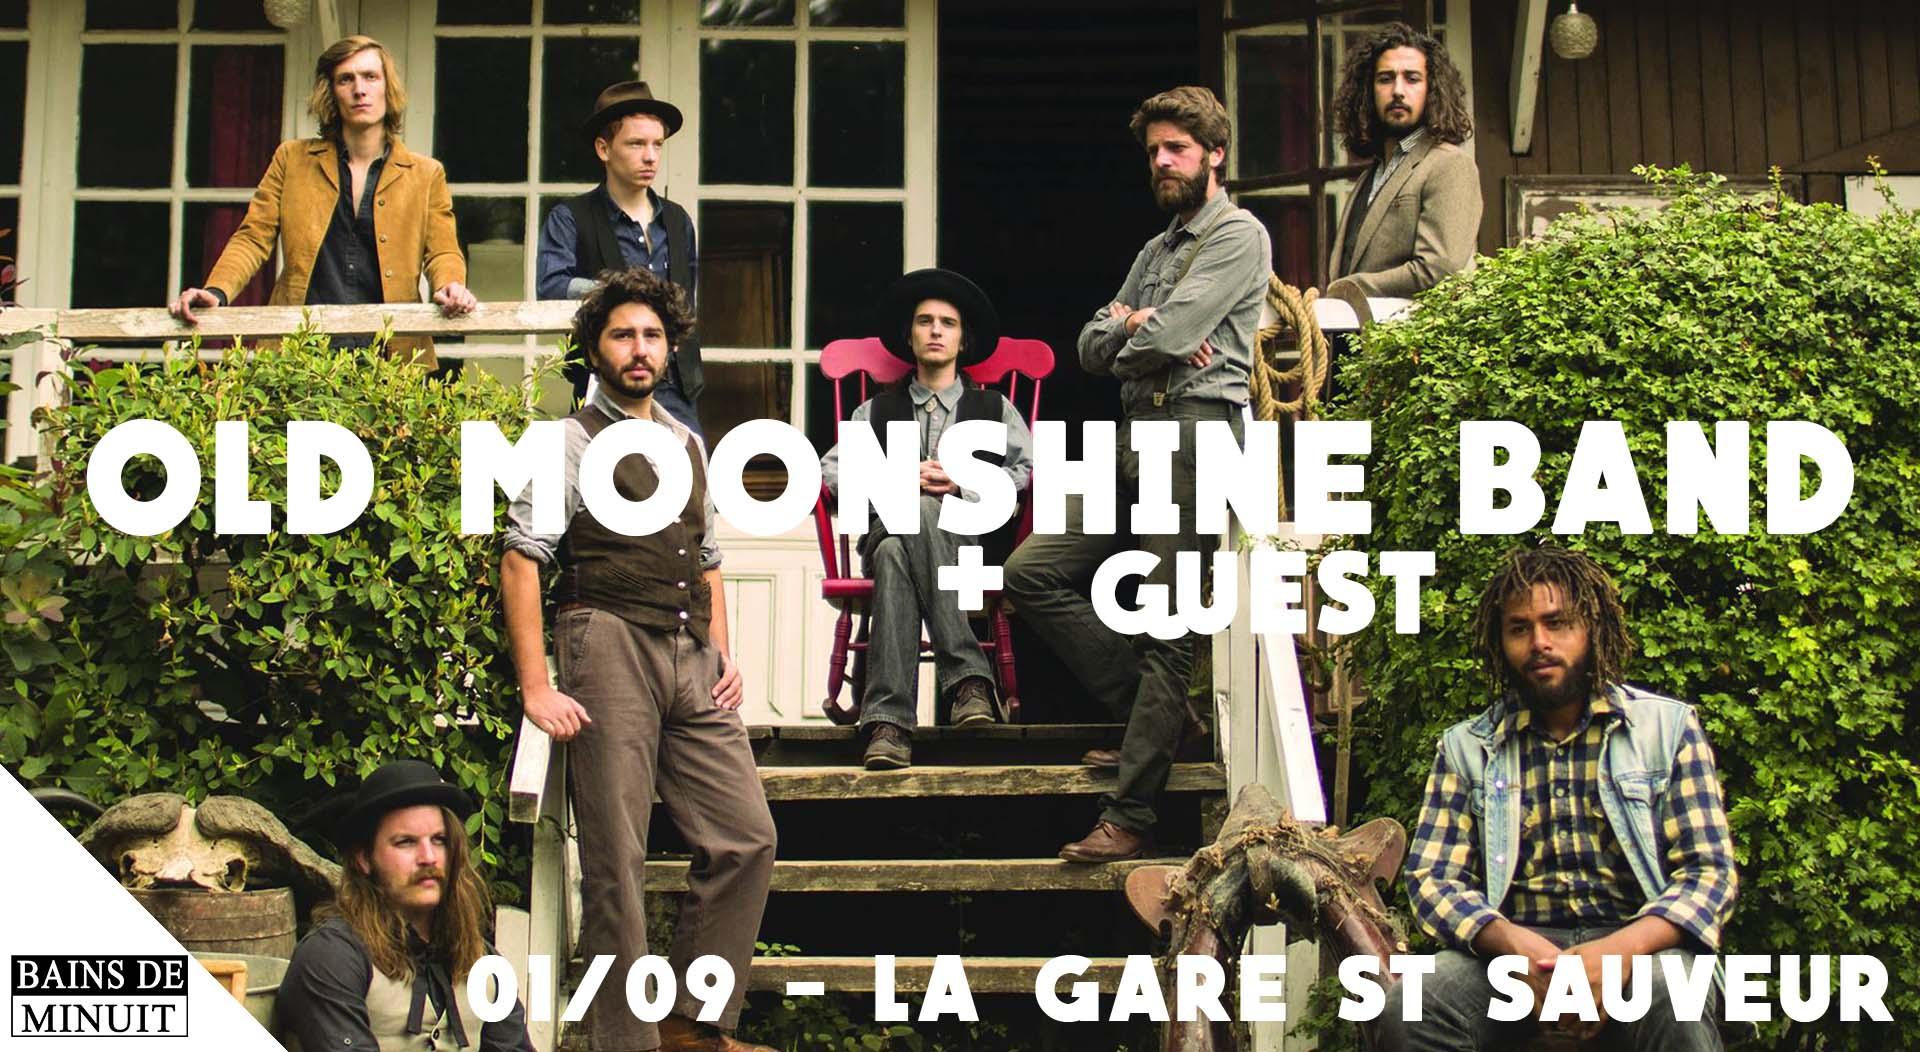 01/09 – OLD MOONSHINE BAND (fr) + The Night Owl News (Lille) / Gare Saint Sauveur, Lille (Gratuit)